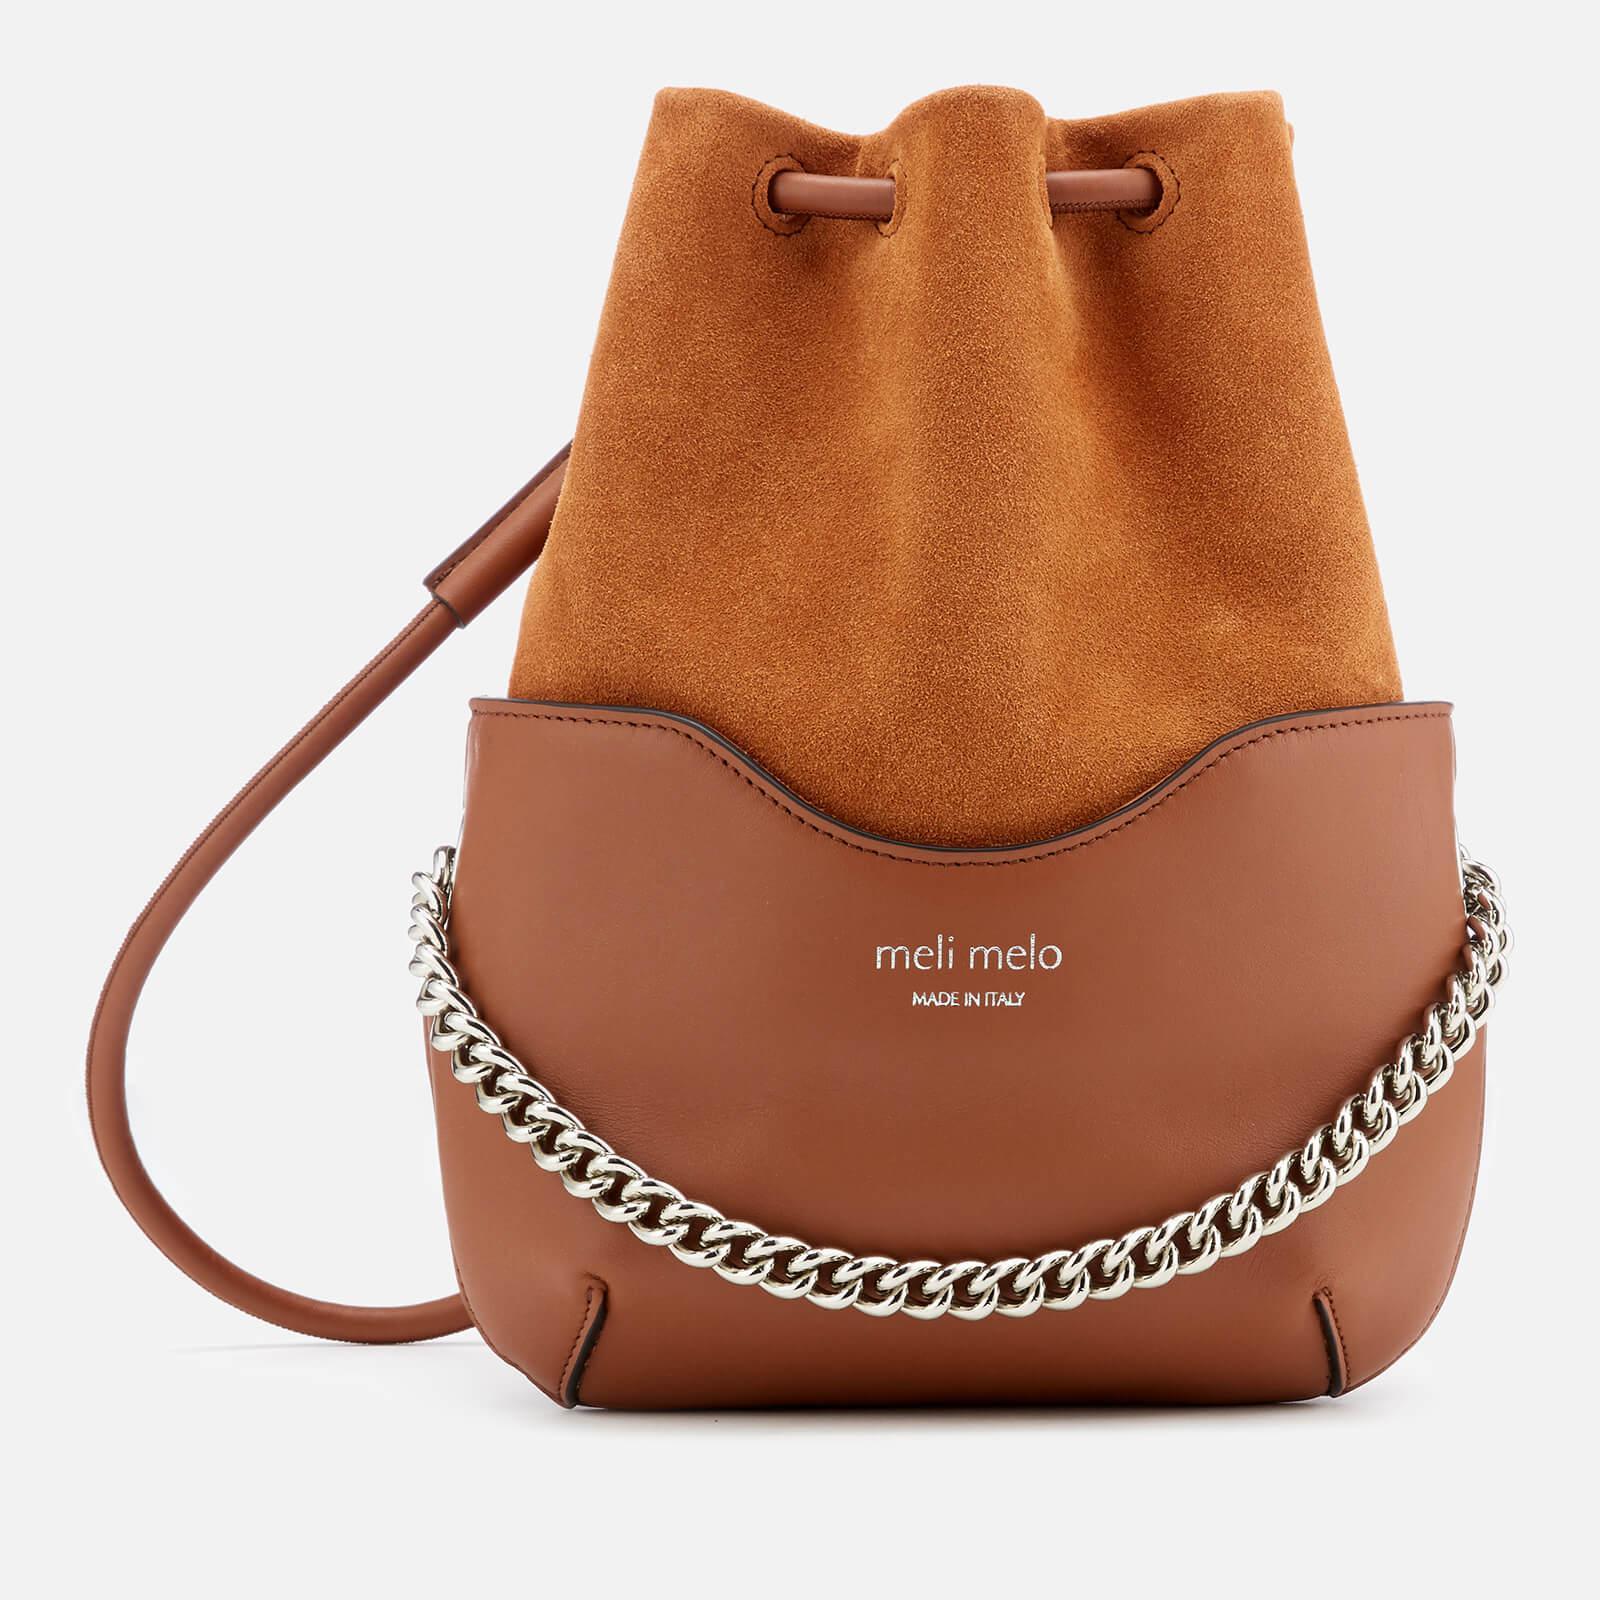 Lyst - meli melo Hetty Shoulder Bag in Brown 9440901c45f28